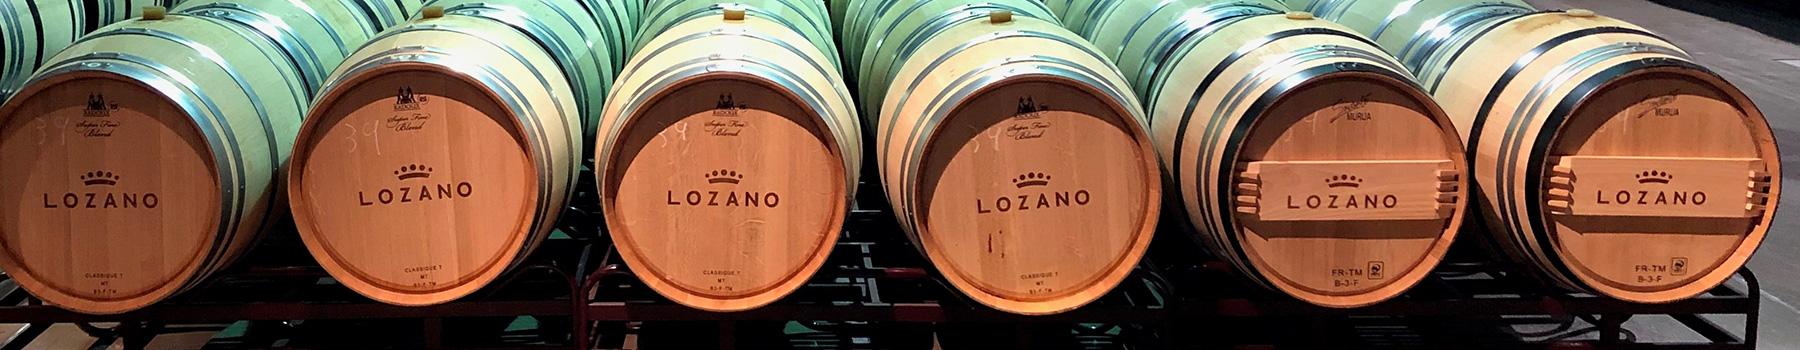 Enoturismo - Experiencias - Crea tu propio vino- Bodegas Lozano